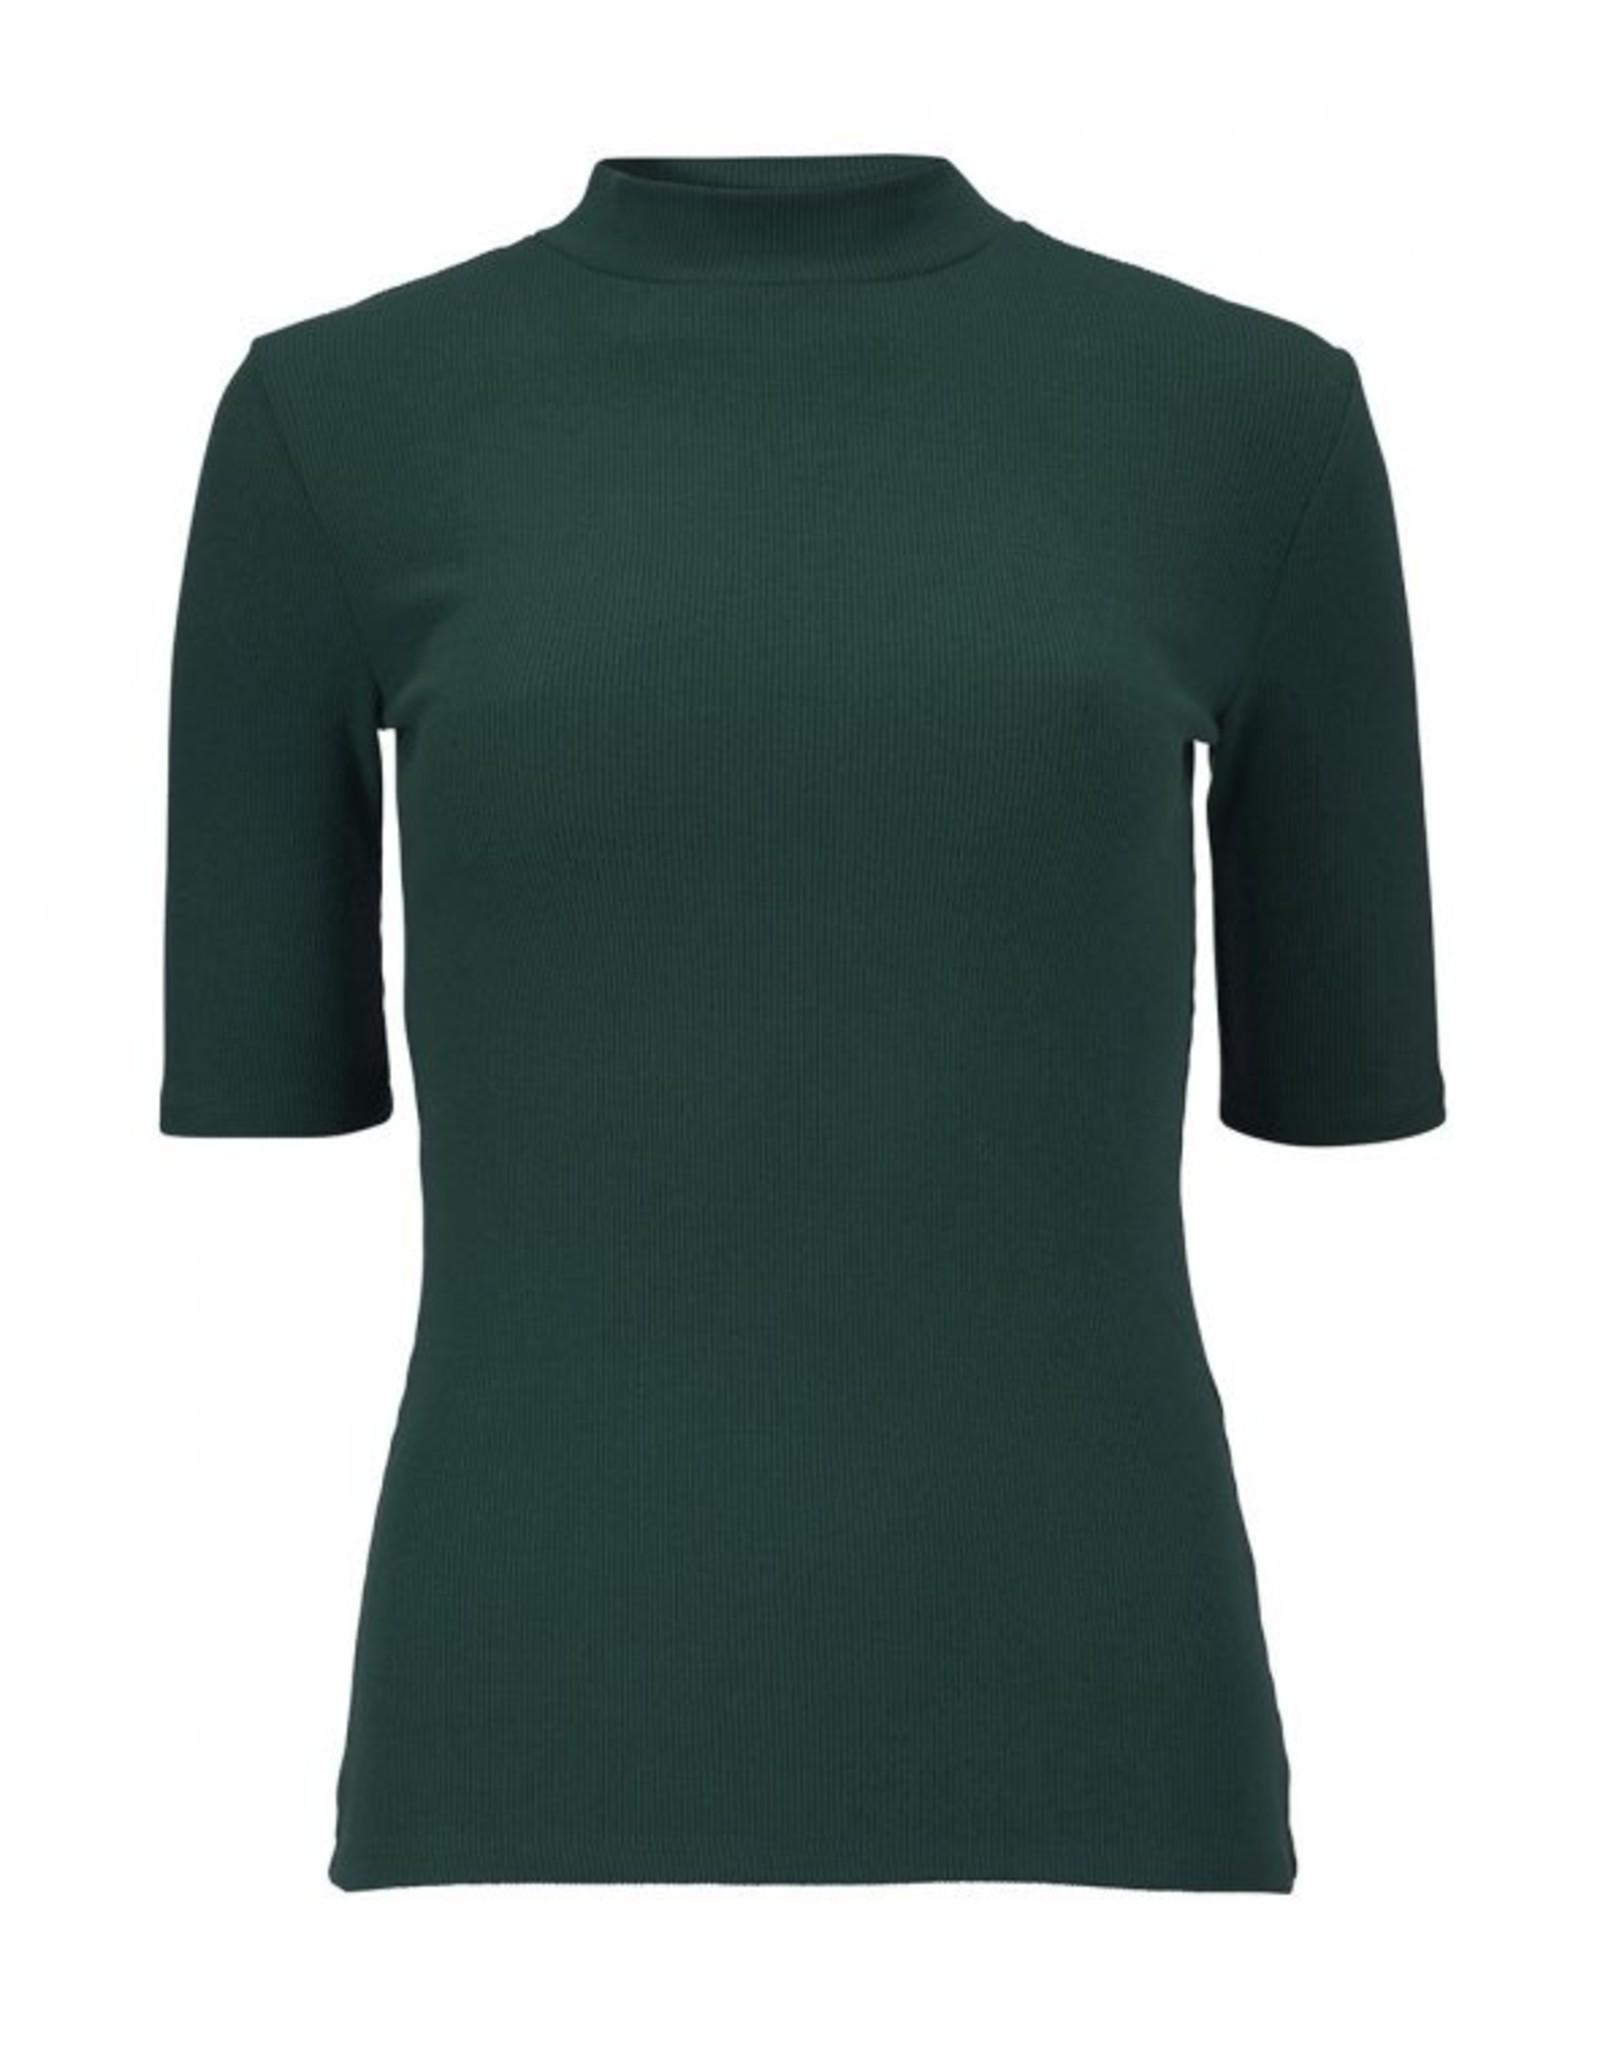 Modstrom Krown T-Shirt Bottle Green